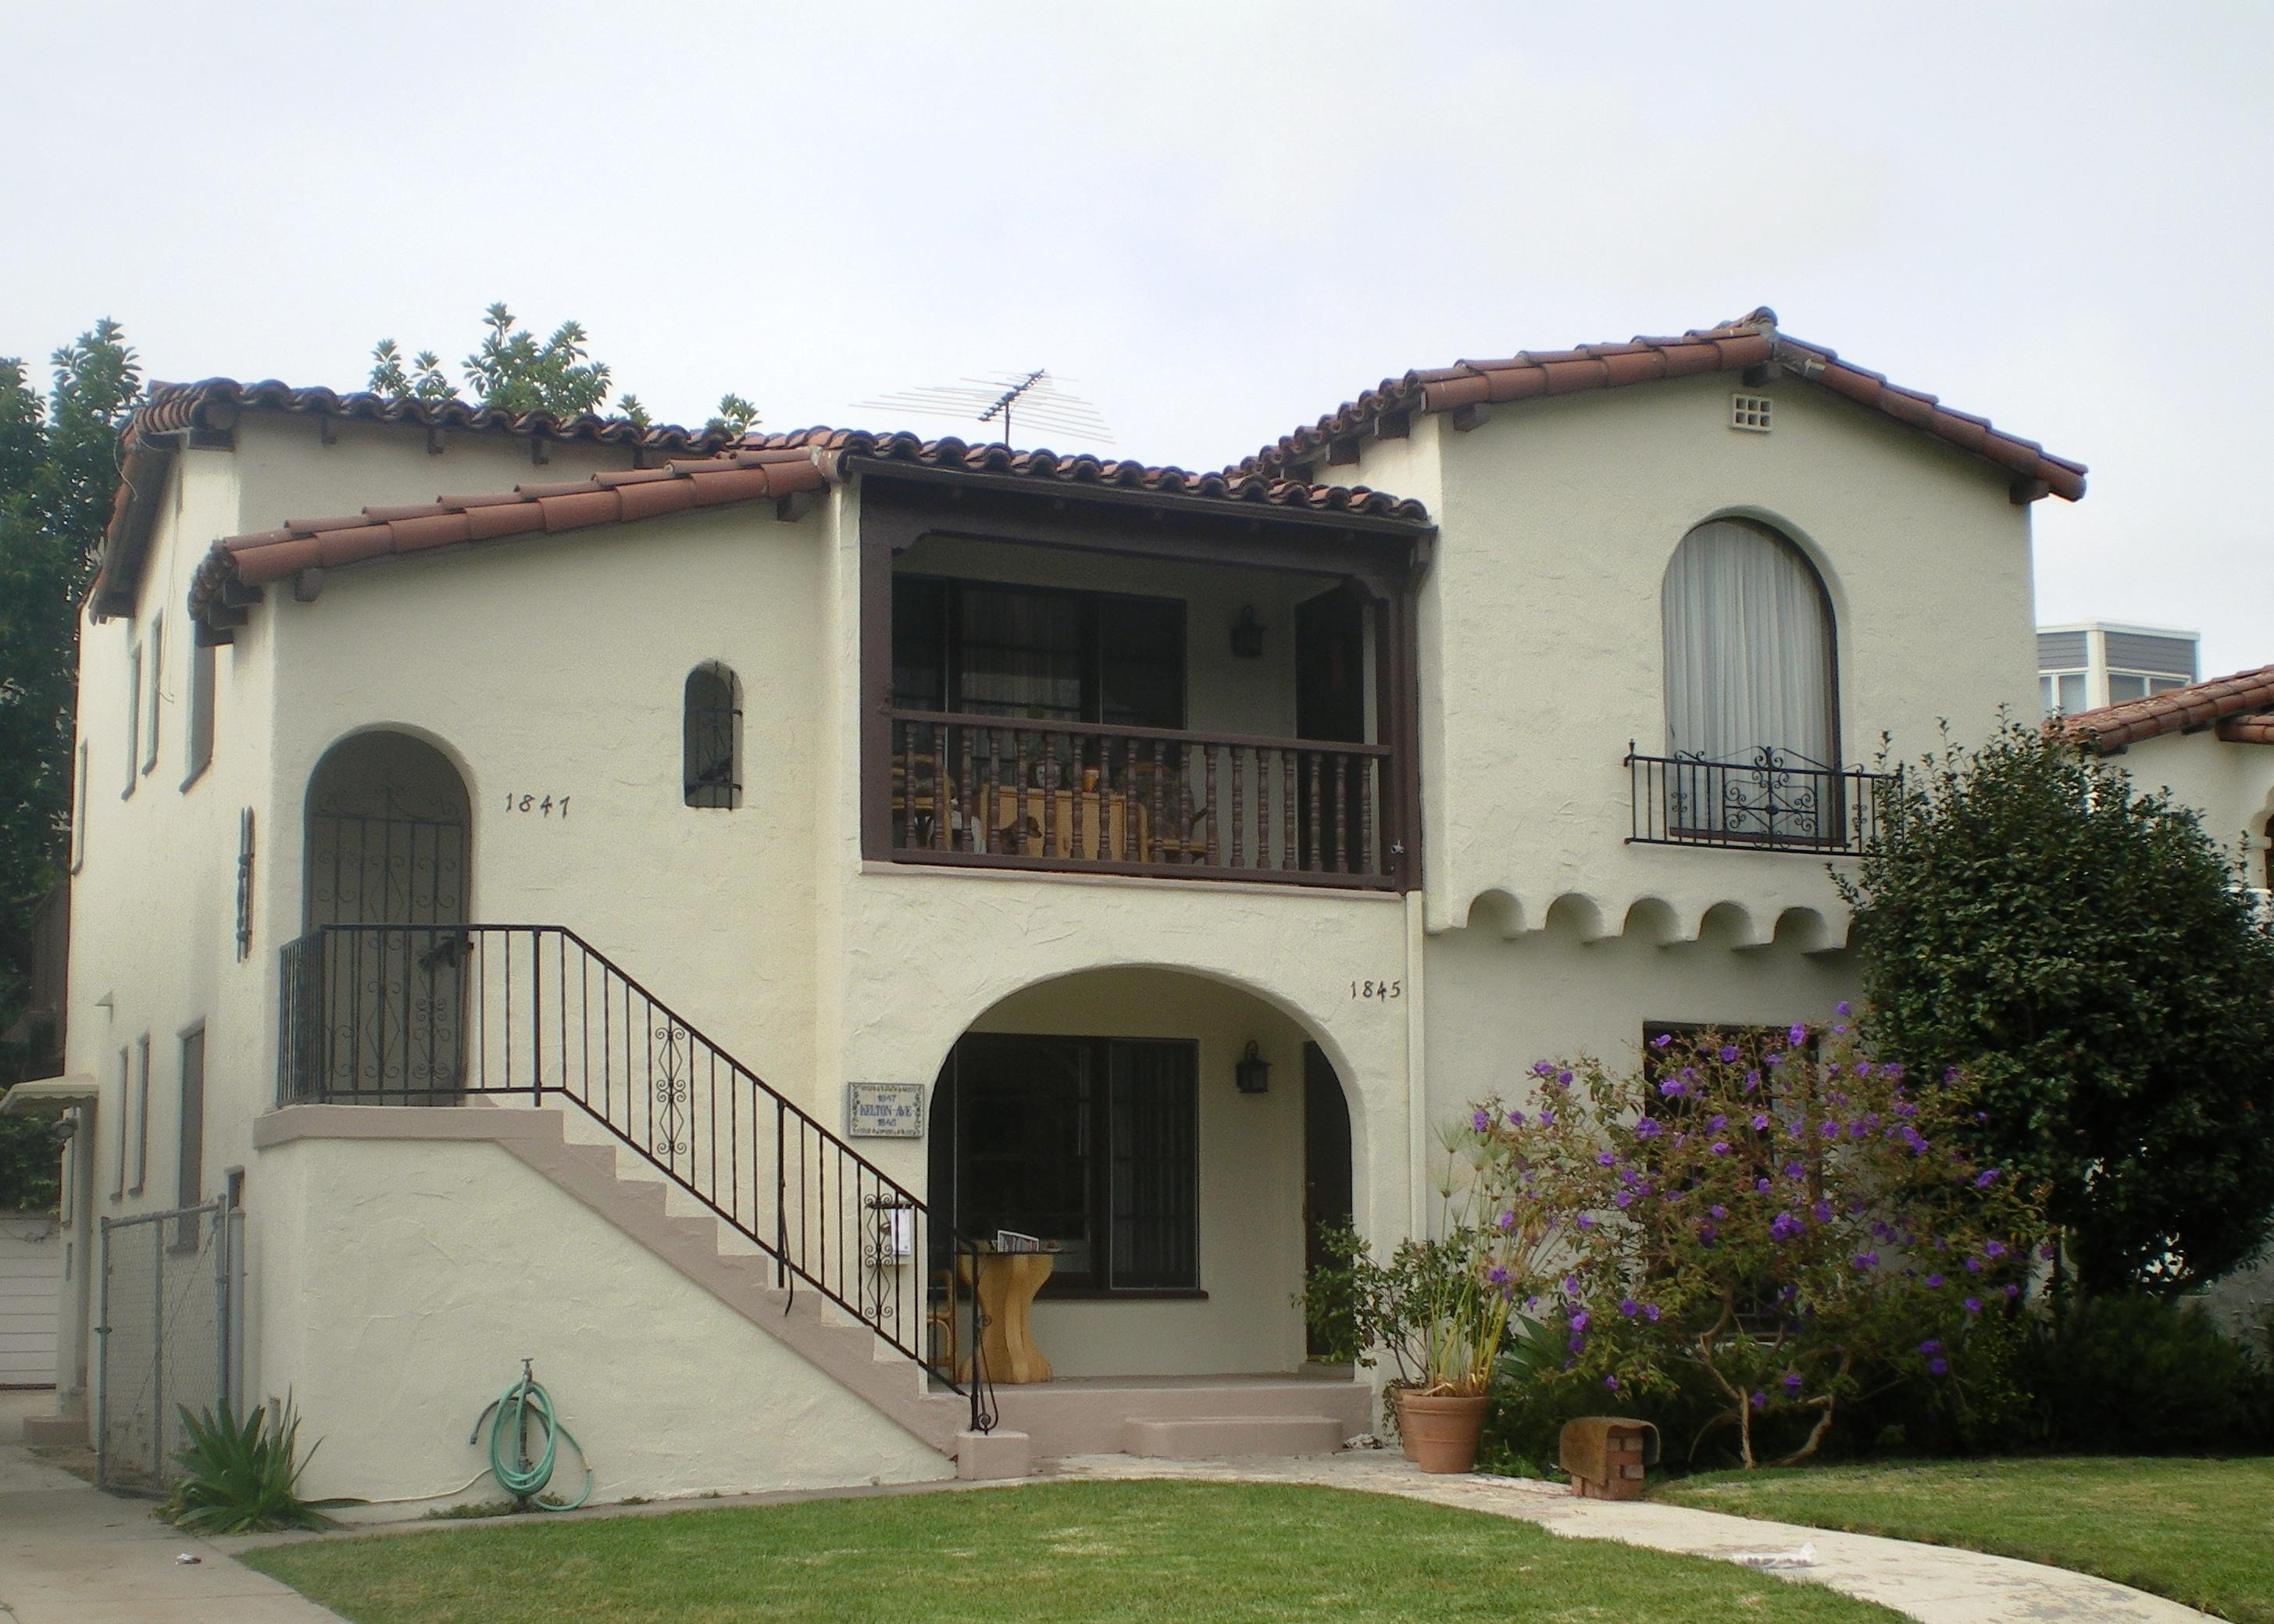 File:Pengelly House (West Los Angeles).jpg - Wikimedia Commons